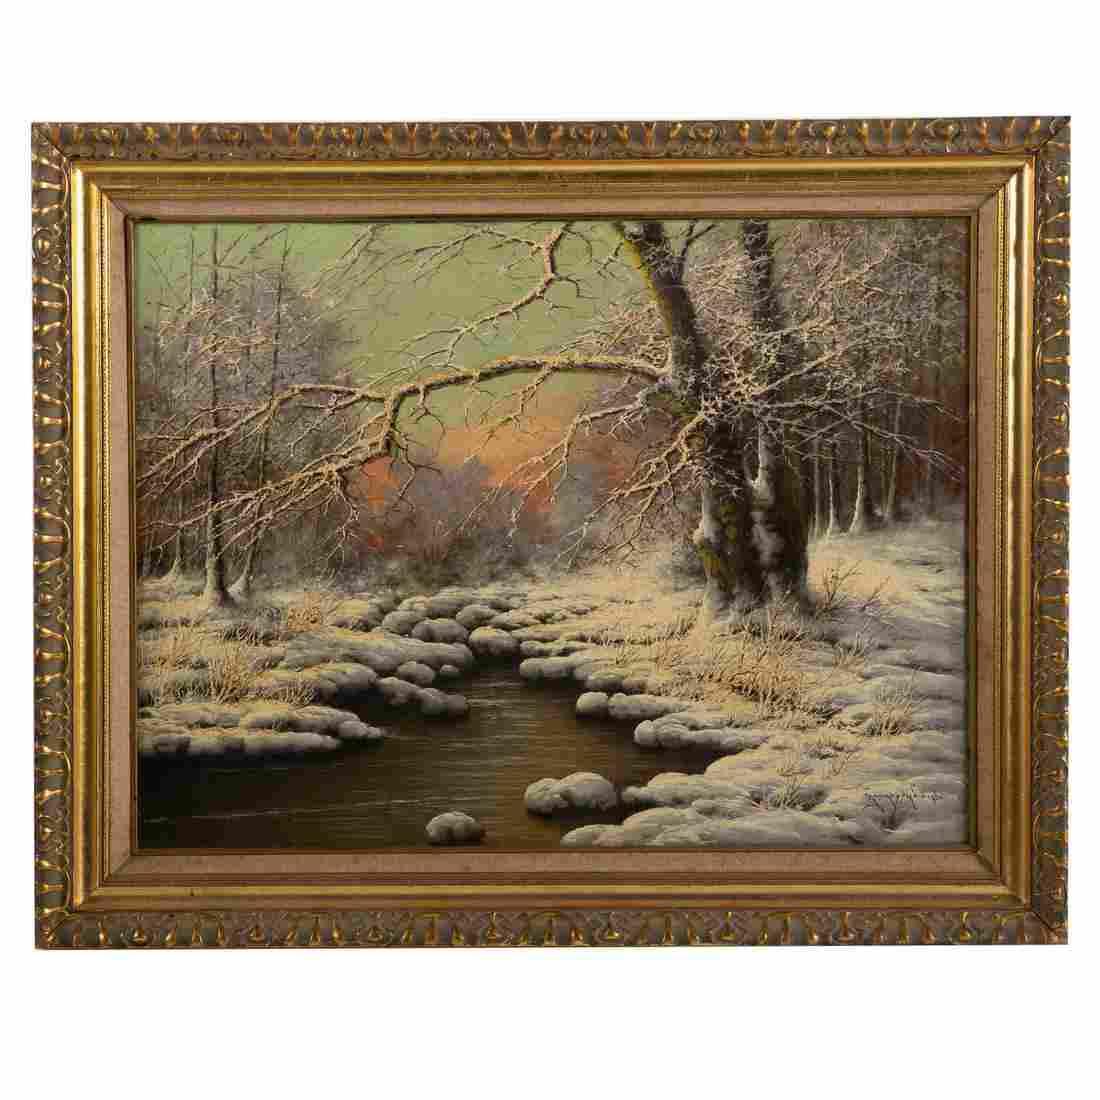 Laszlo Neogrady. Snowy Landscape, oil on canvas